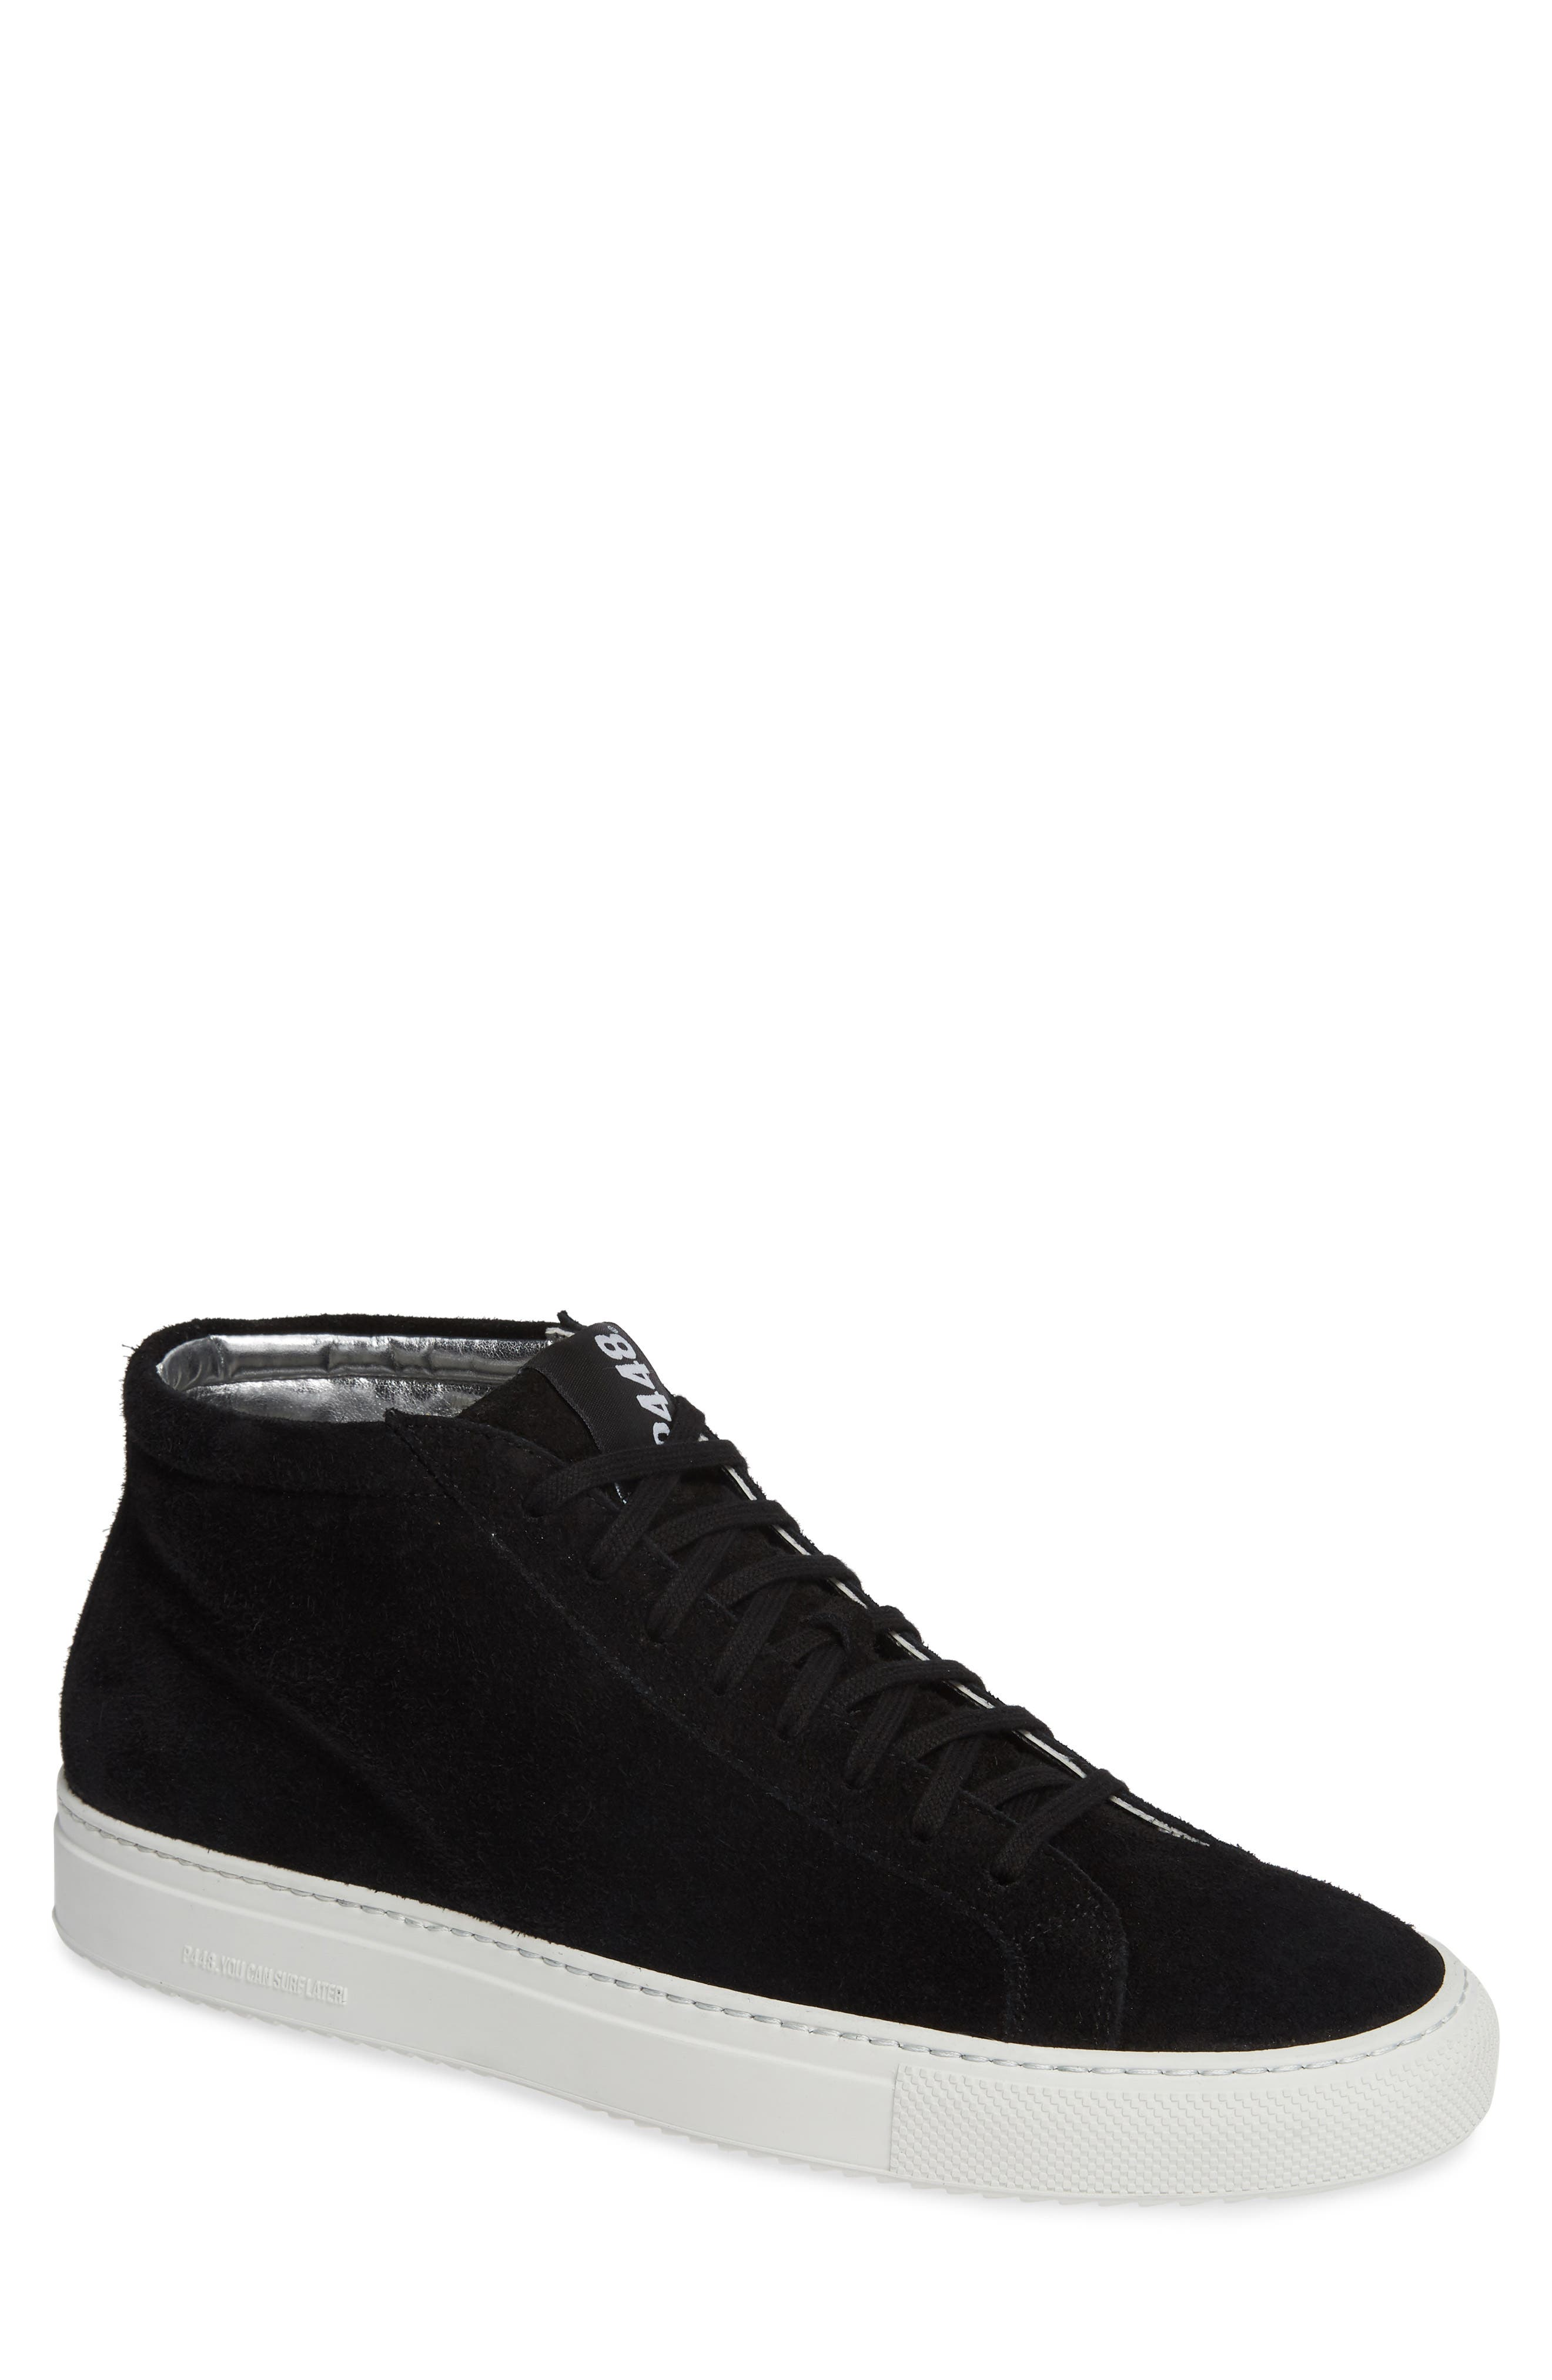 A8Elevent Mid Sneaker,                         Main,                         color, BLACK BRUSH